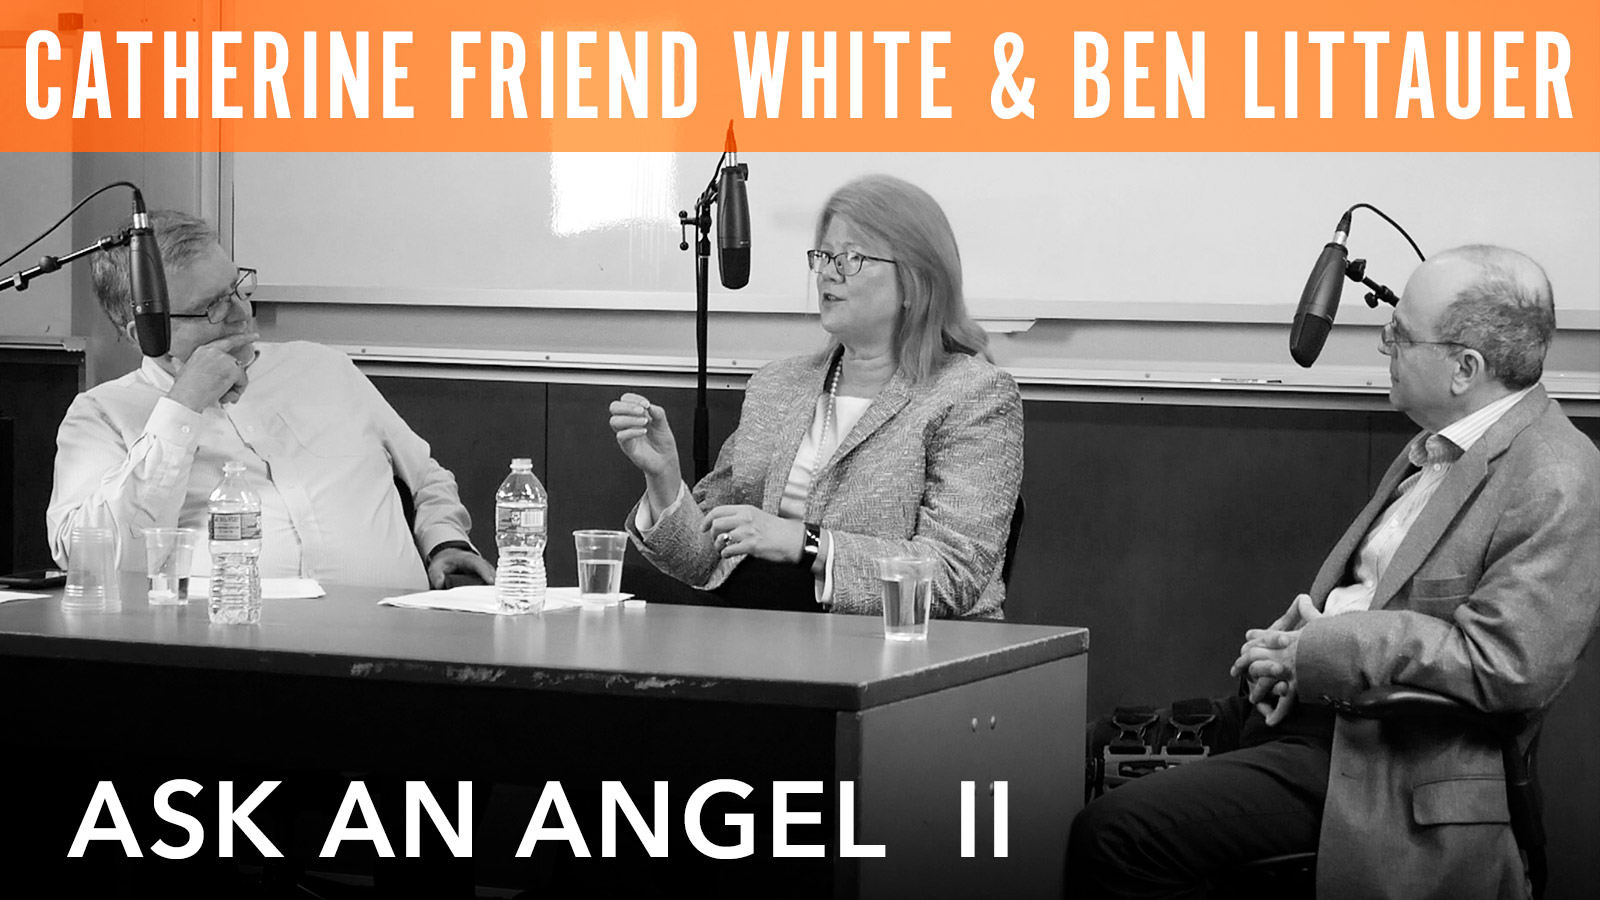 Catherine Friend White & Ben Littauer  Ask an Angel II